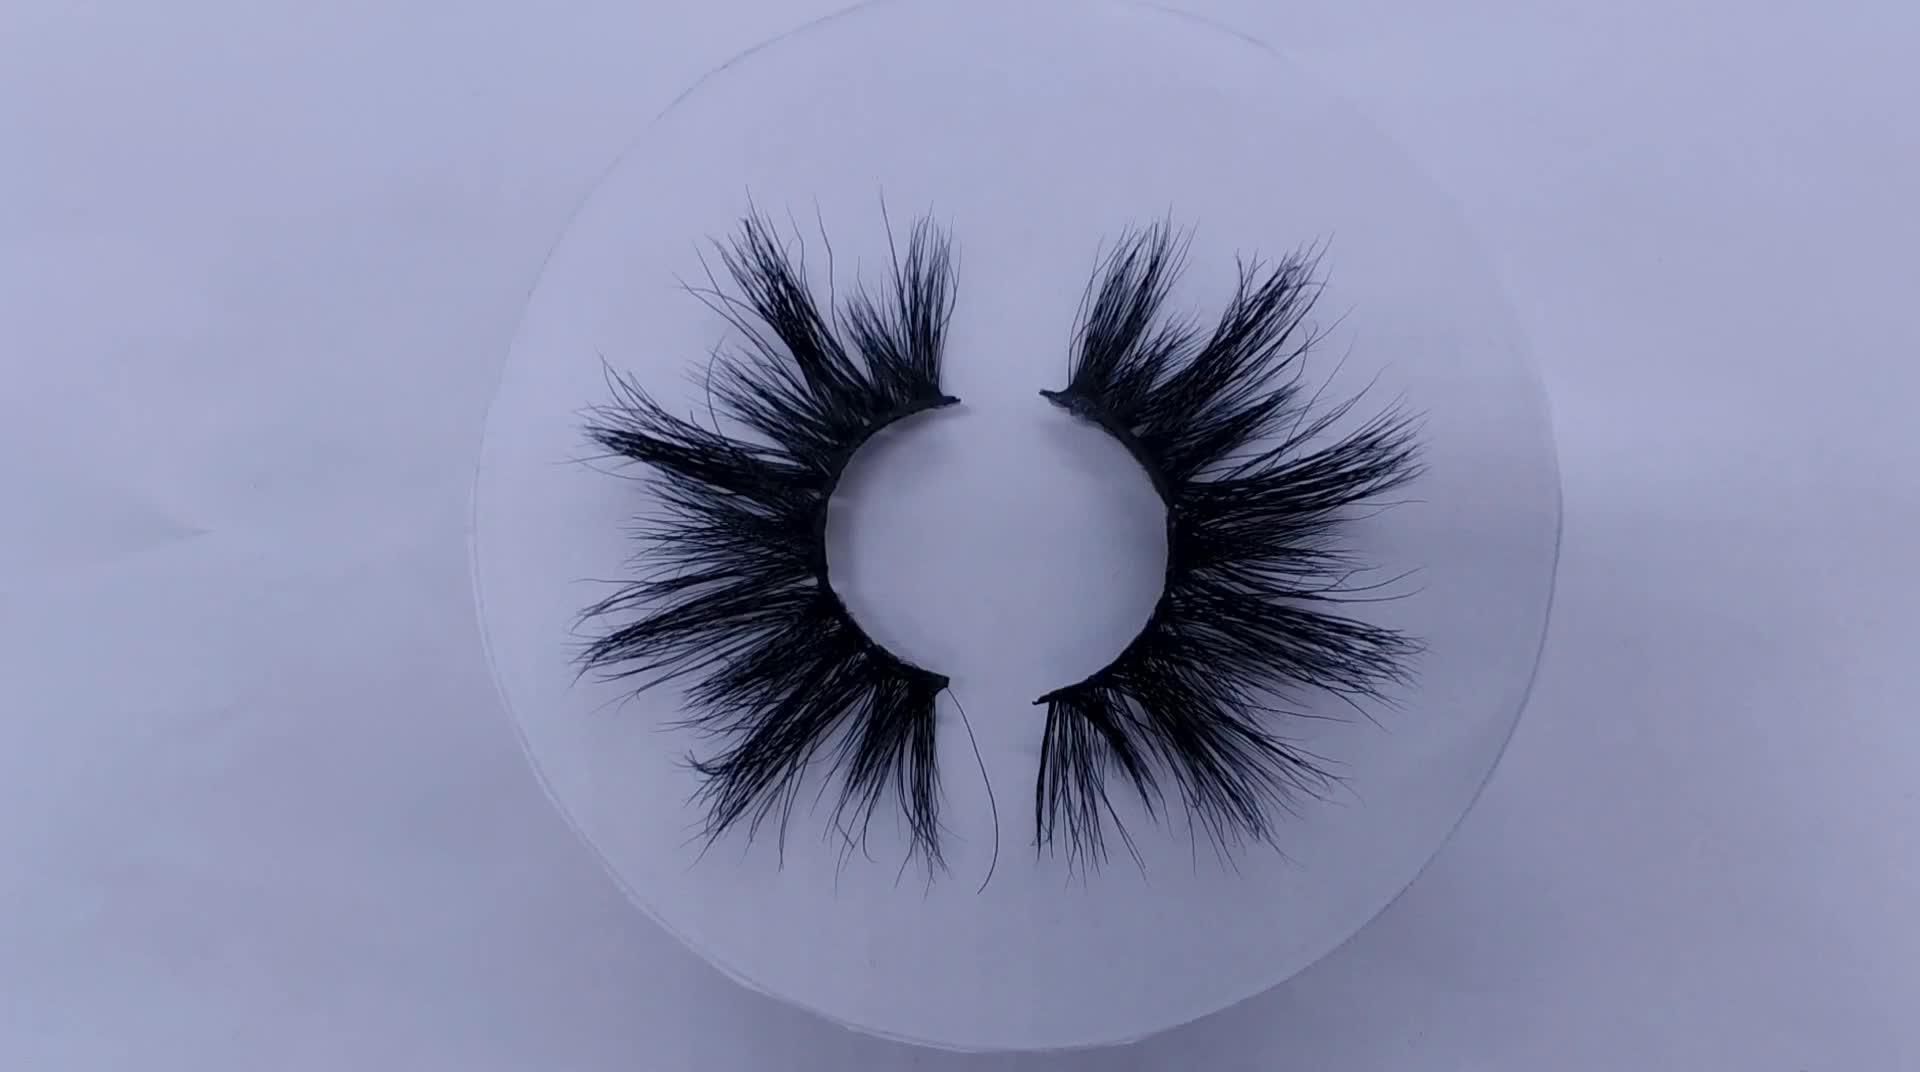 एसवाई lashes shuying 5d मिंक lashes 25mm रियल 100% साइबेरियाई मिंक eyelashes अतिरिक्त लंबे eyelashes 25mm मिंक eyelashes विक्रेता